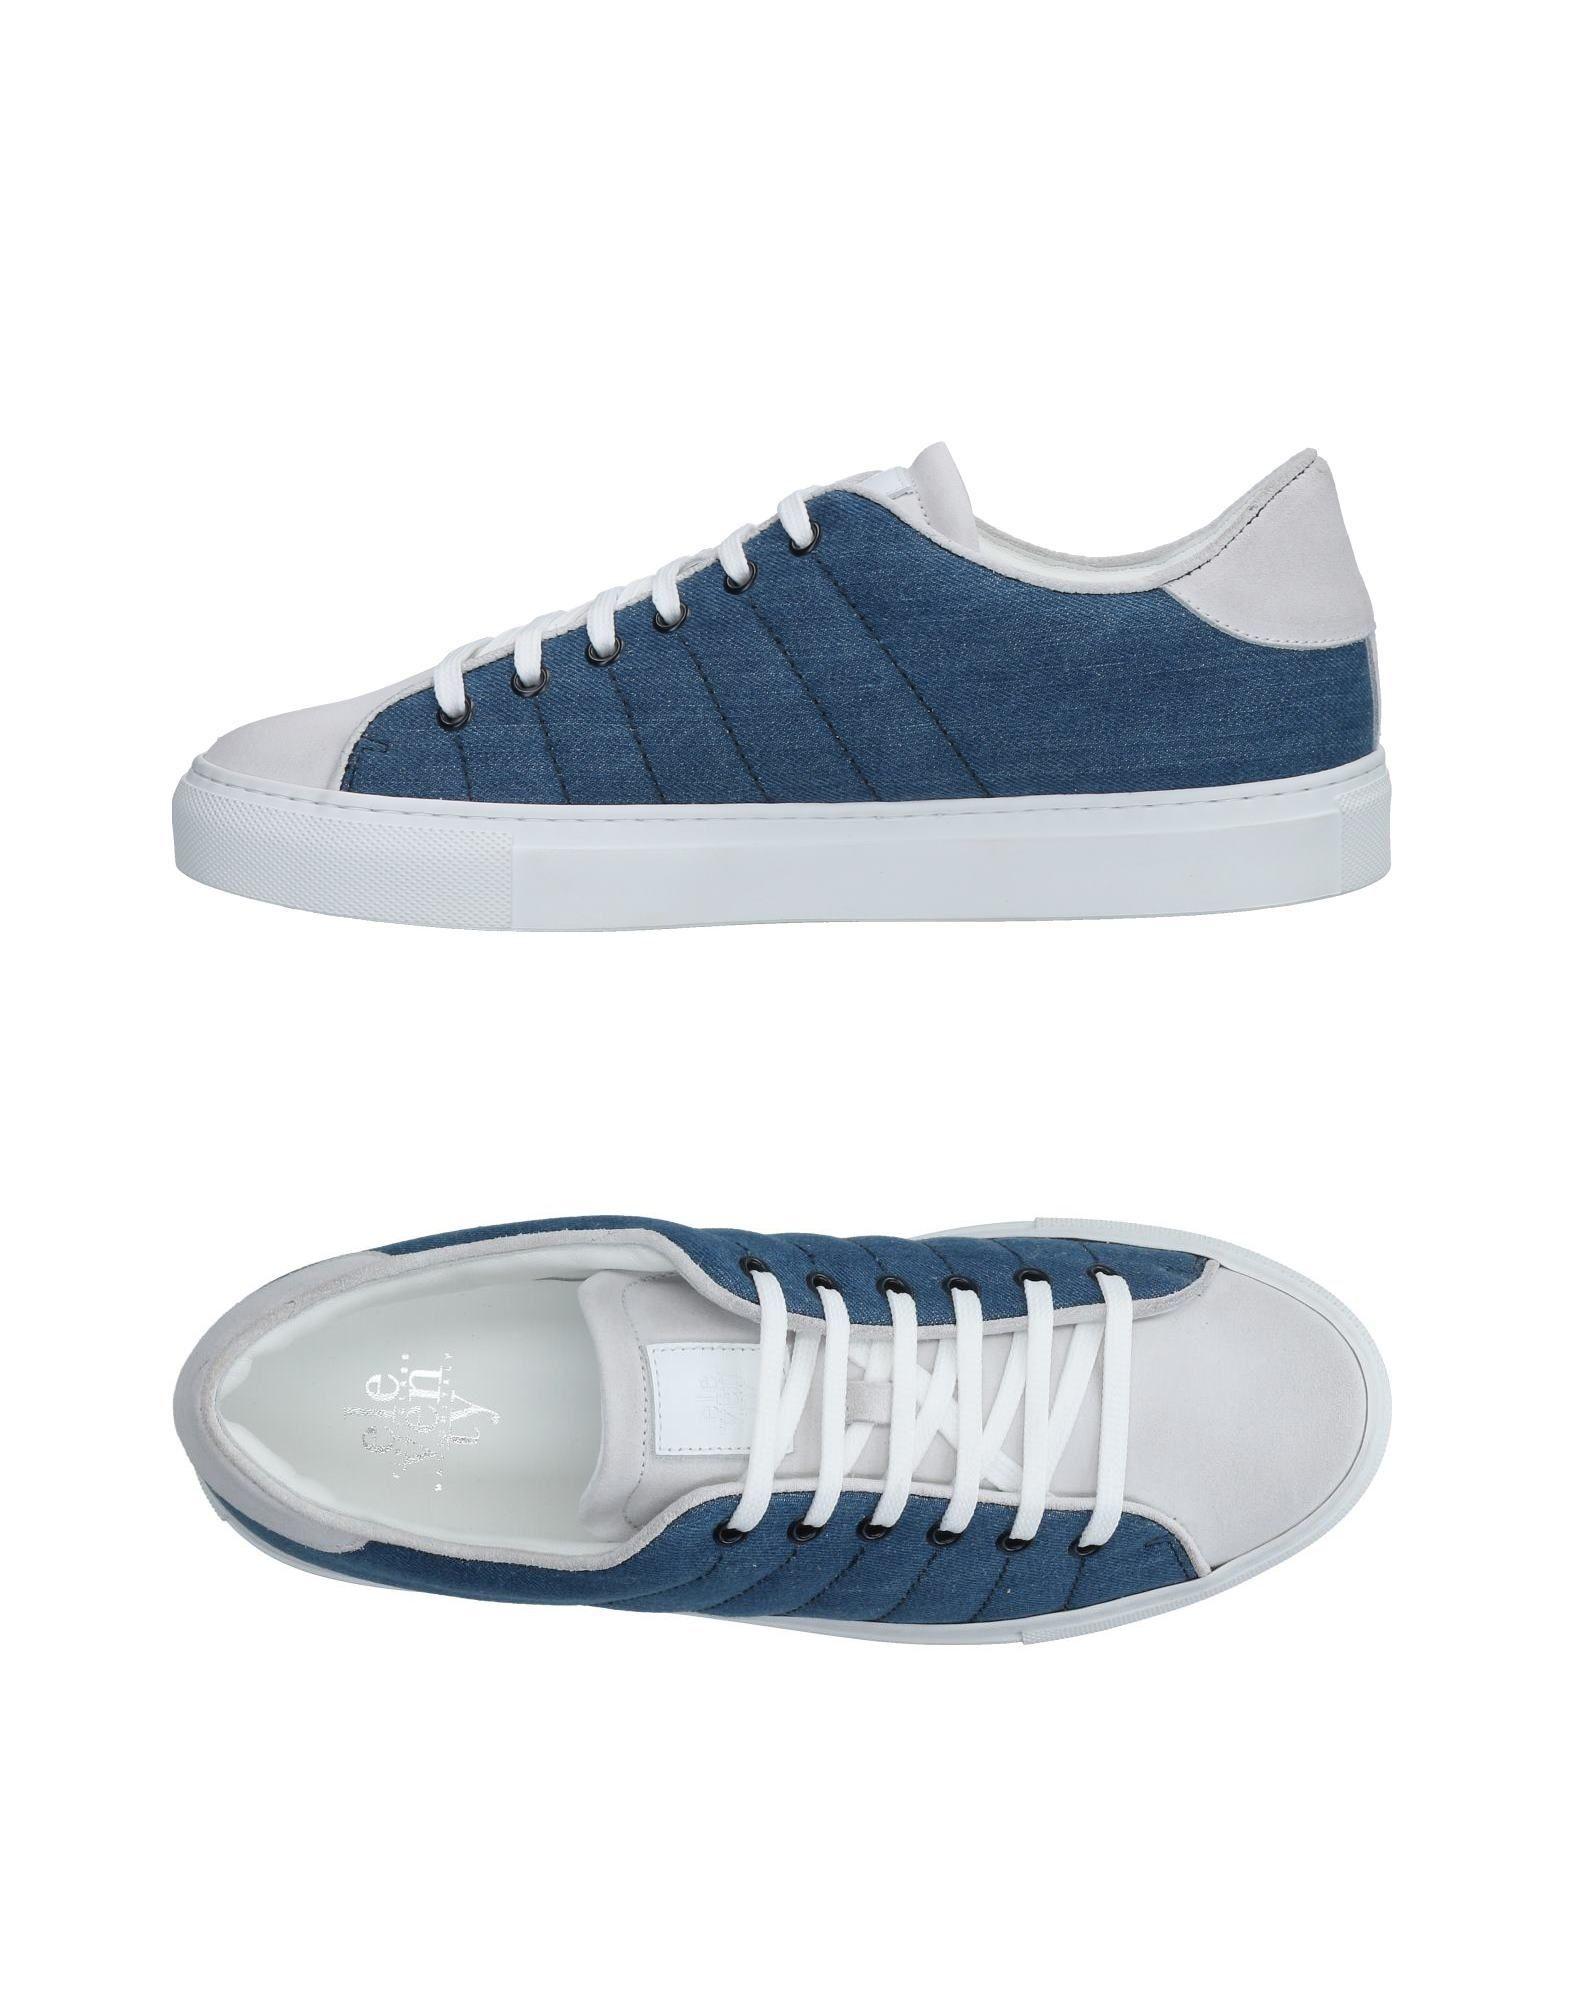 Moda Sneakers Eleventy Eleventy Eleventy Uomo - 11467767HK beb18c